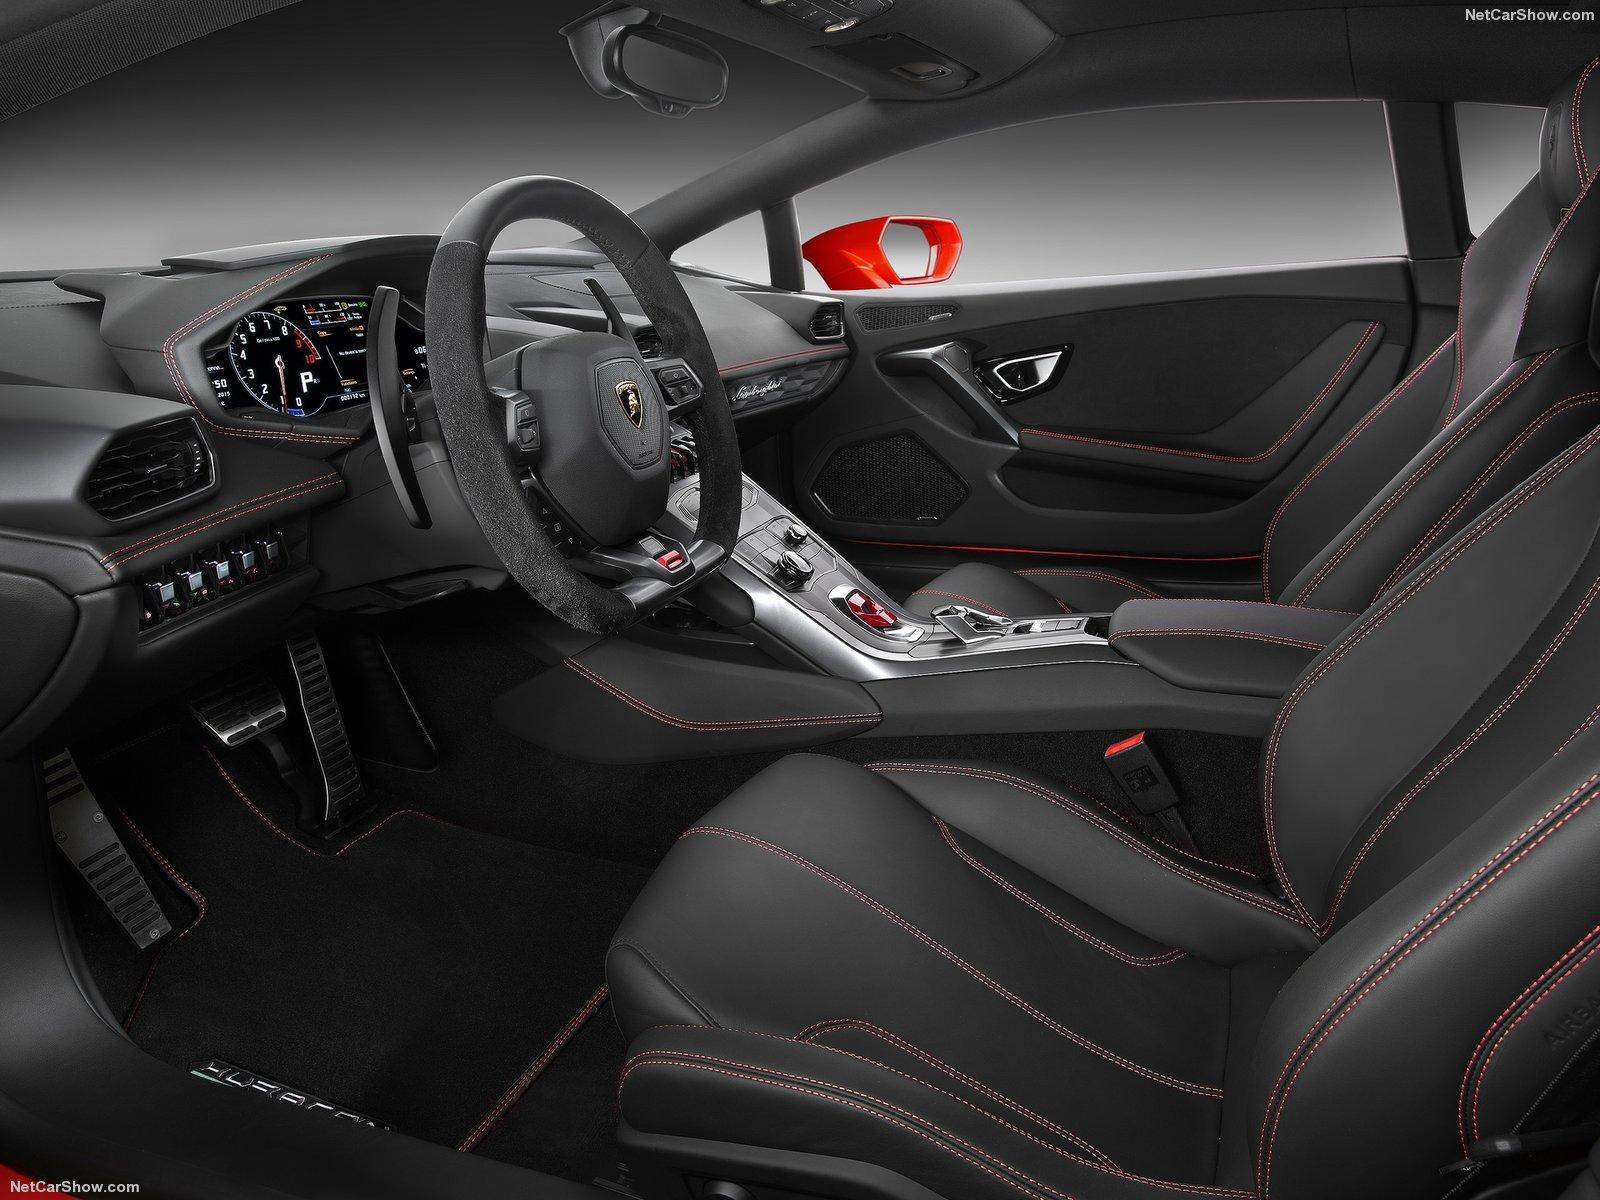 Hình ảnh siêu xe Lamborghini Huracan LP580-2 2017 & nội ngoại thất